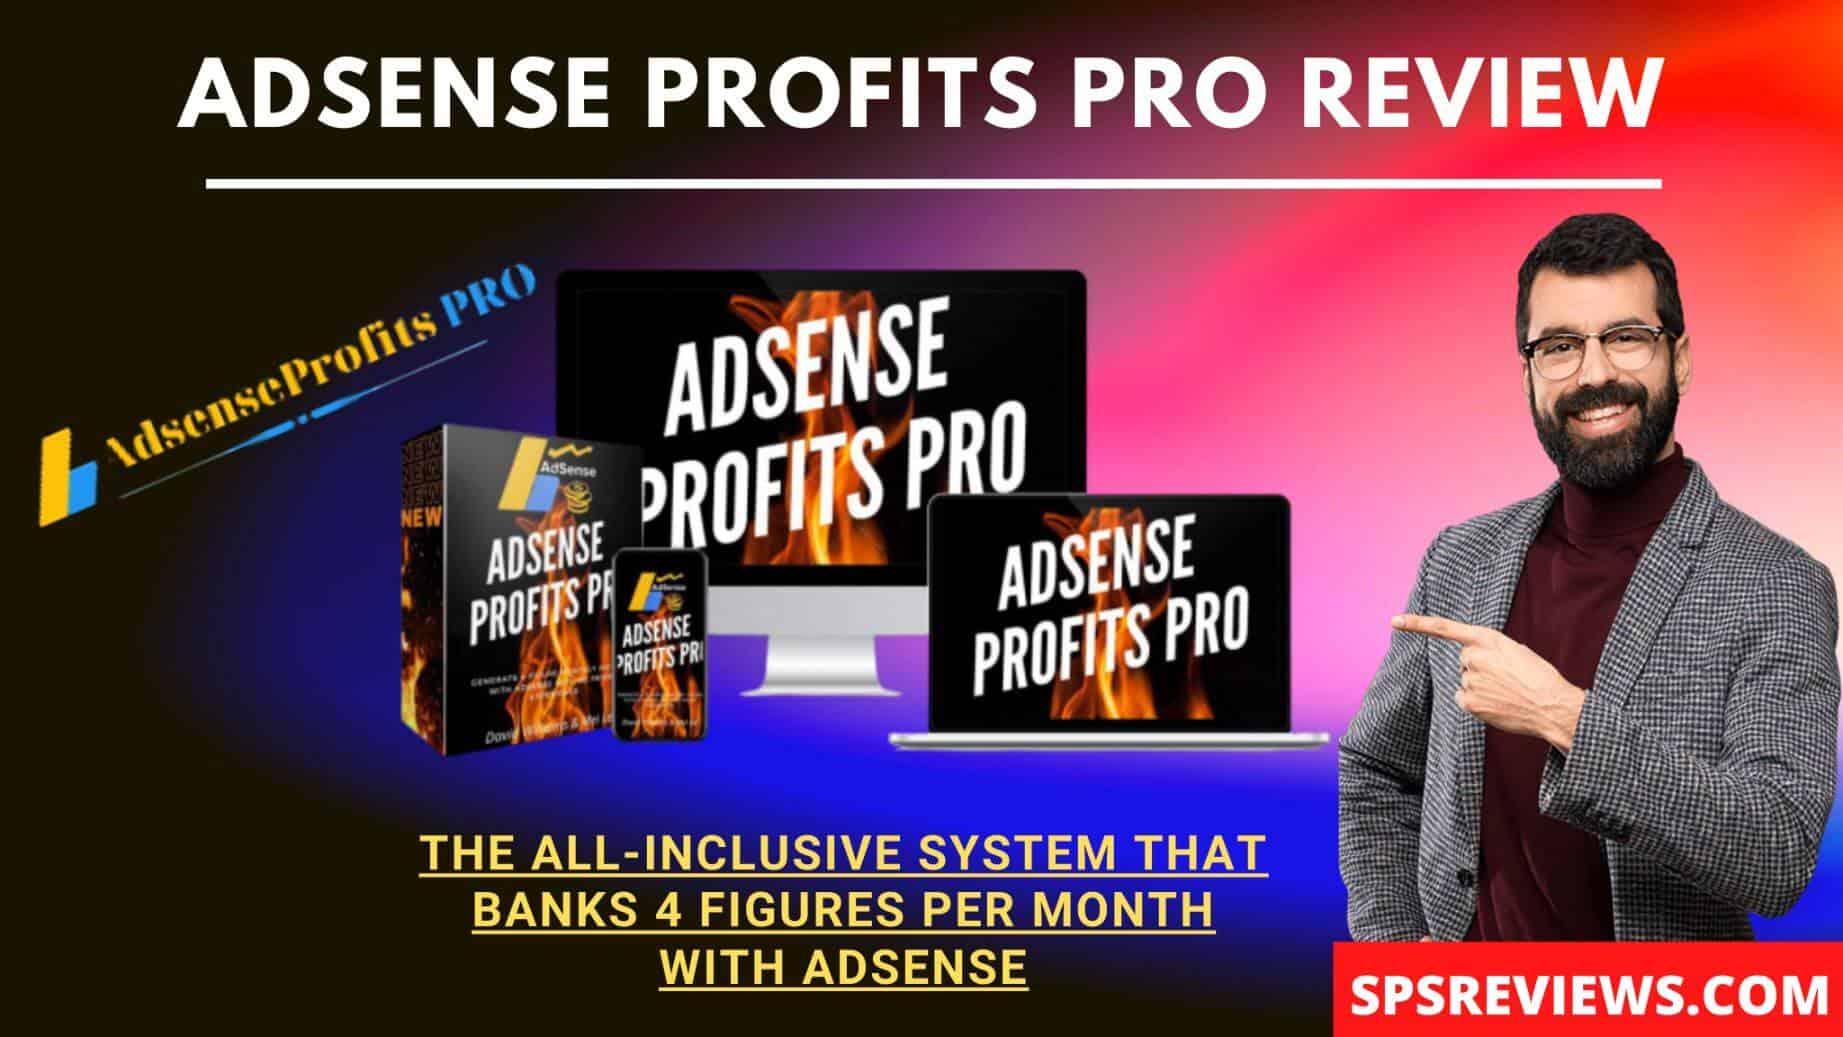 AdSense Profits PRO Review